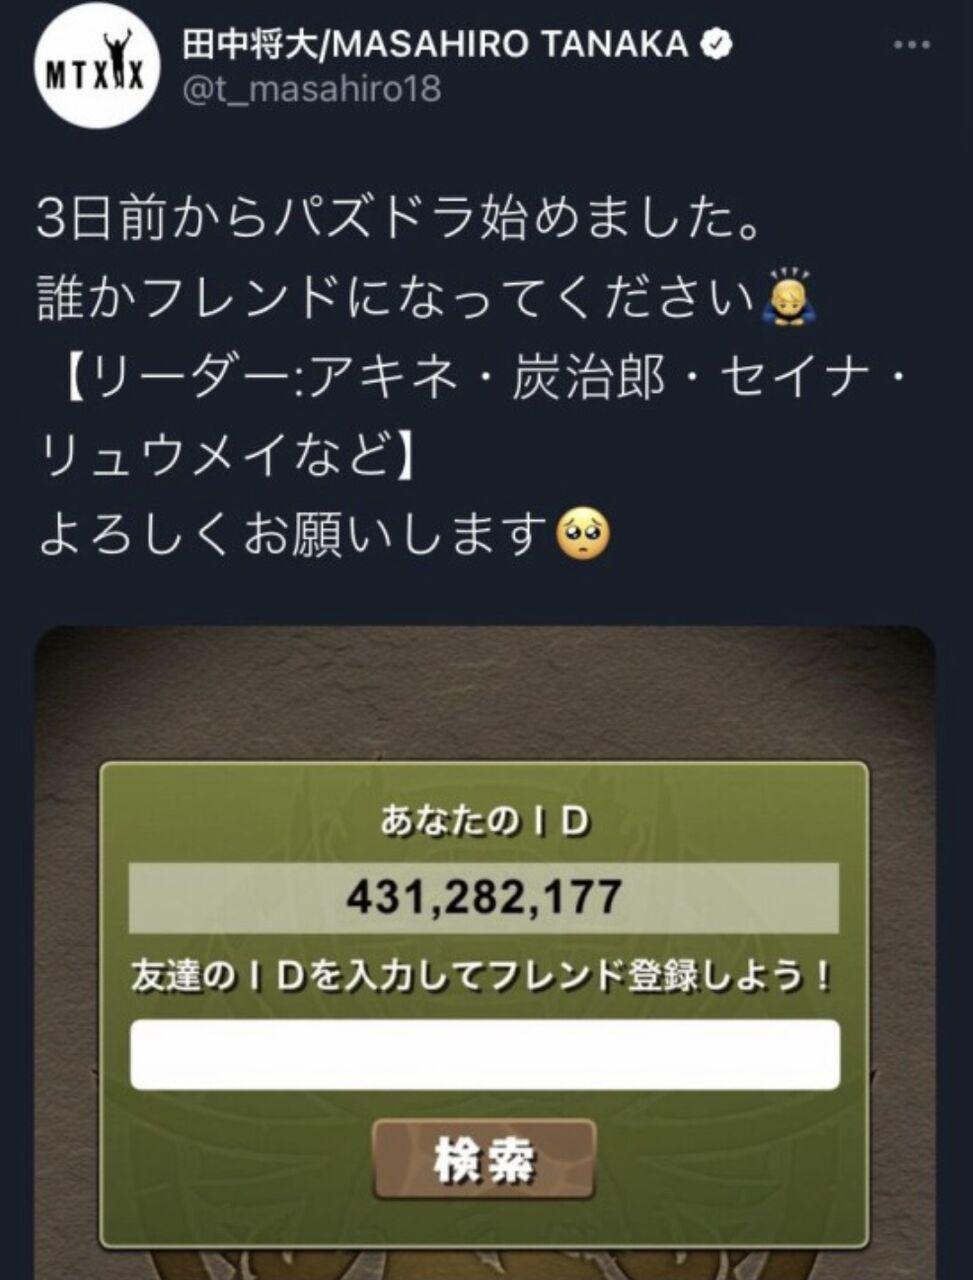 9068E0C3-6BCB-418C-95DE-DB4FDB397379